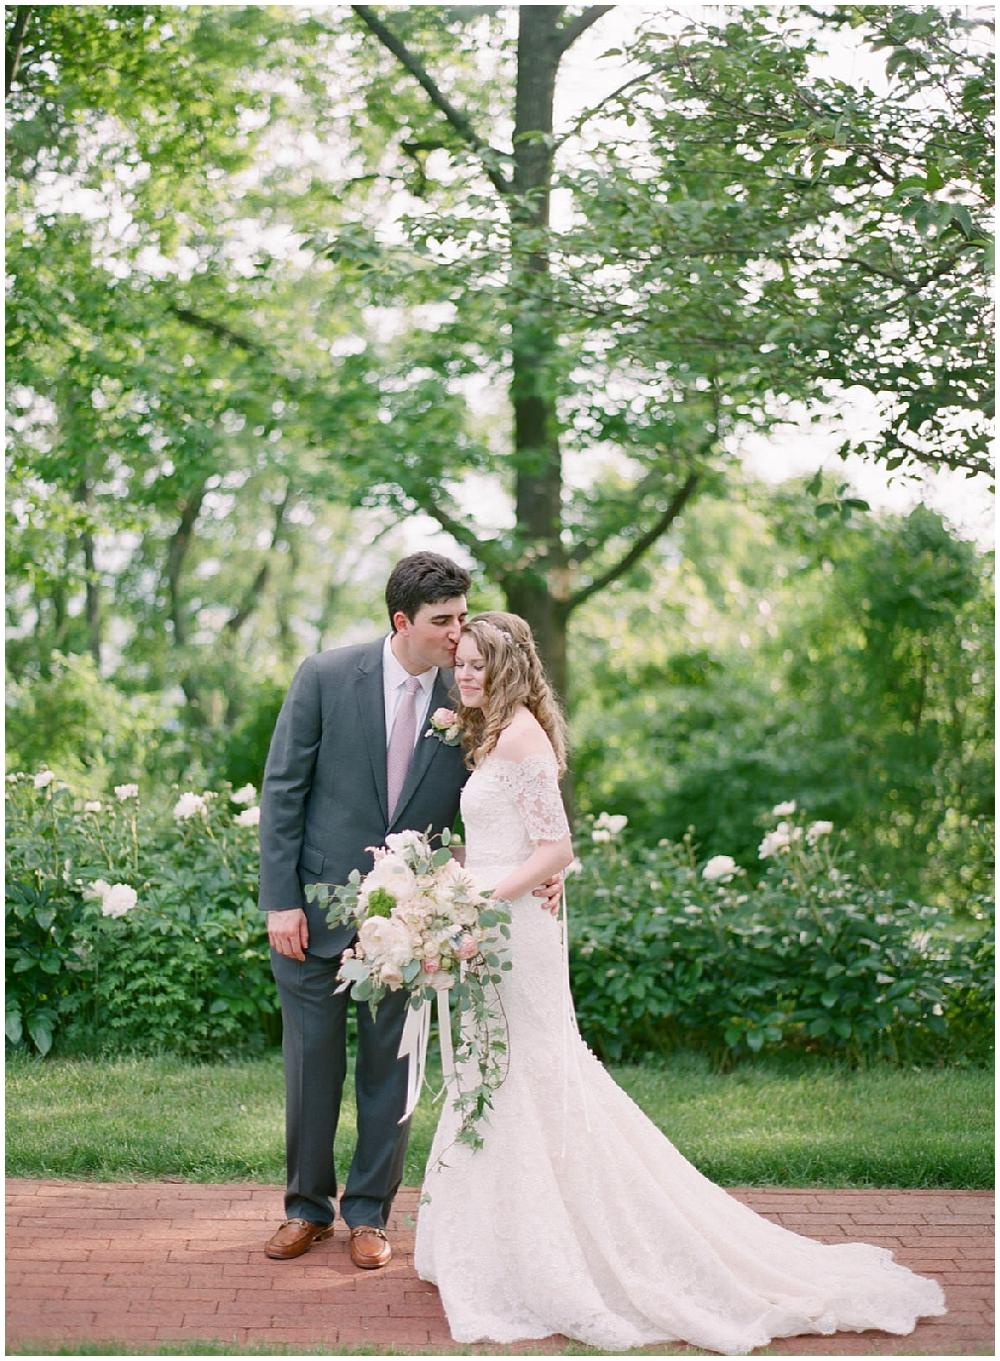 Boscobel-house-gardens-garrison-wedding-photographer-2